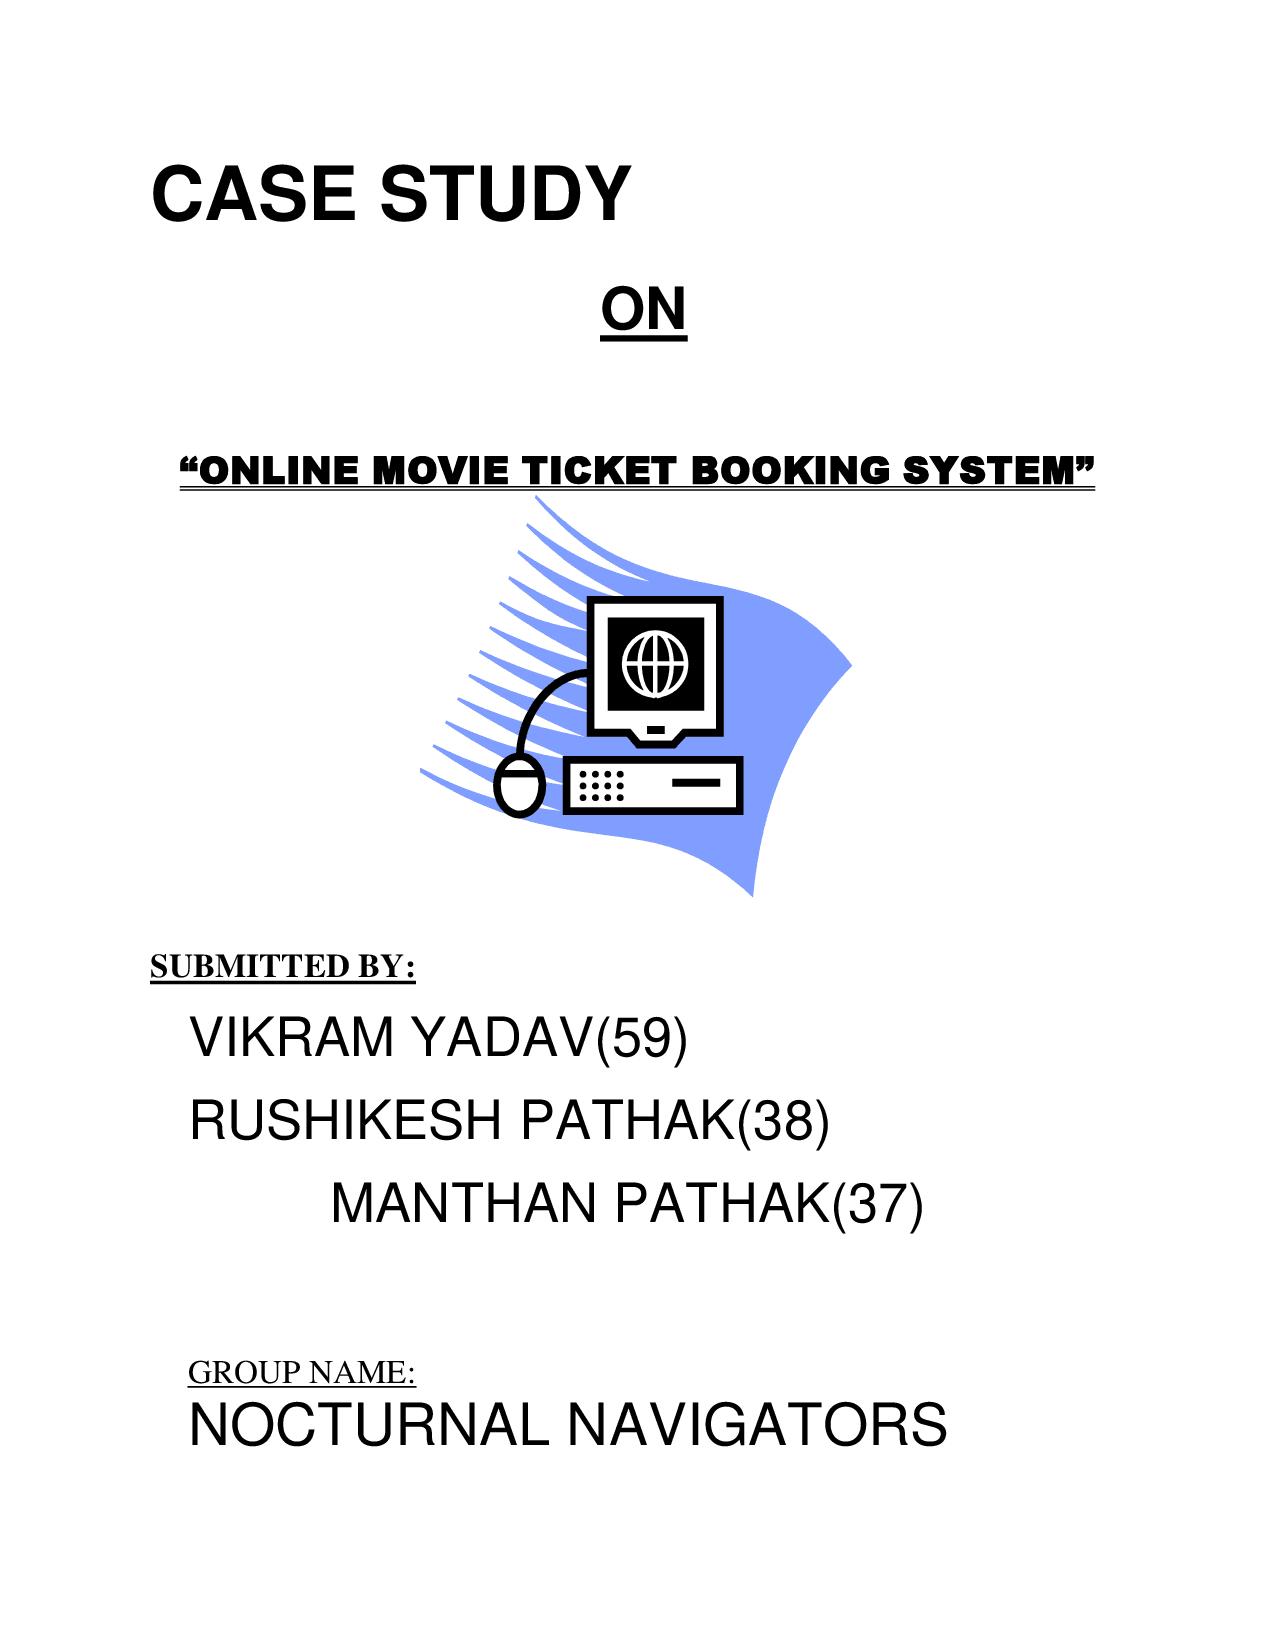 Online Movie Ticket System - Docsity